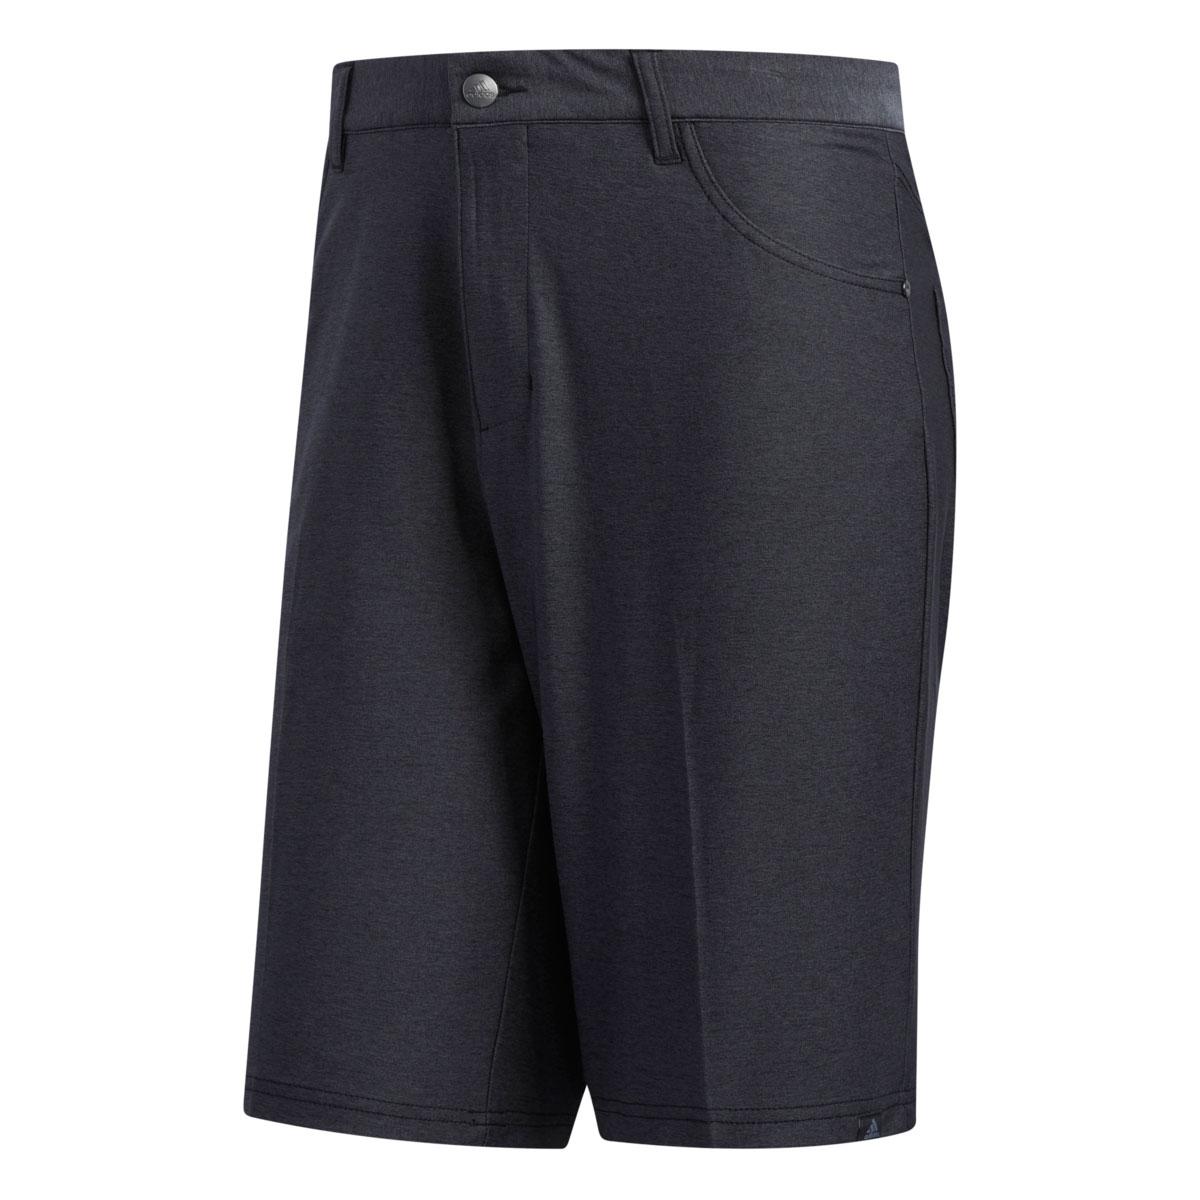 Adidas Ultimate Heather 5 Pocket Black Short